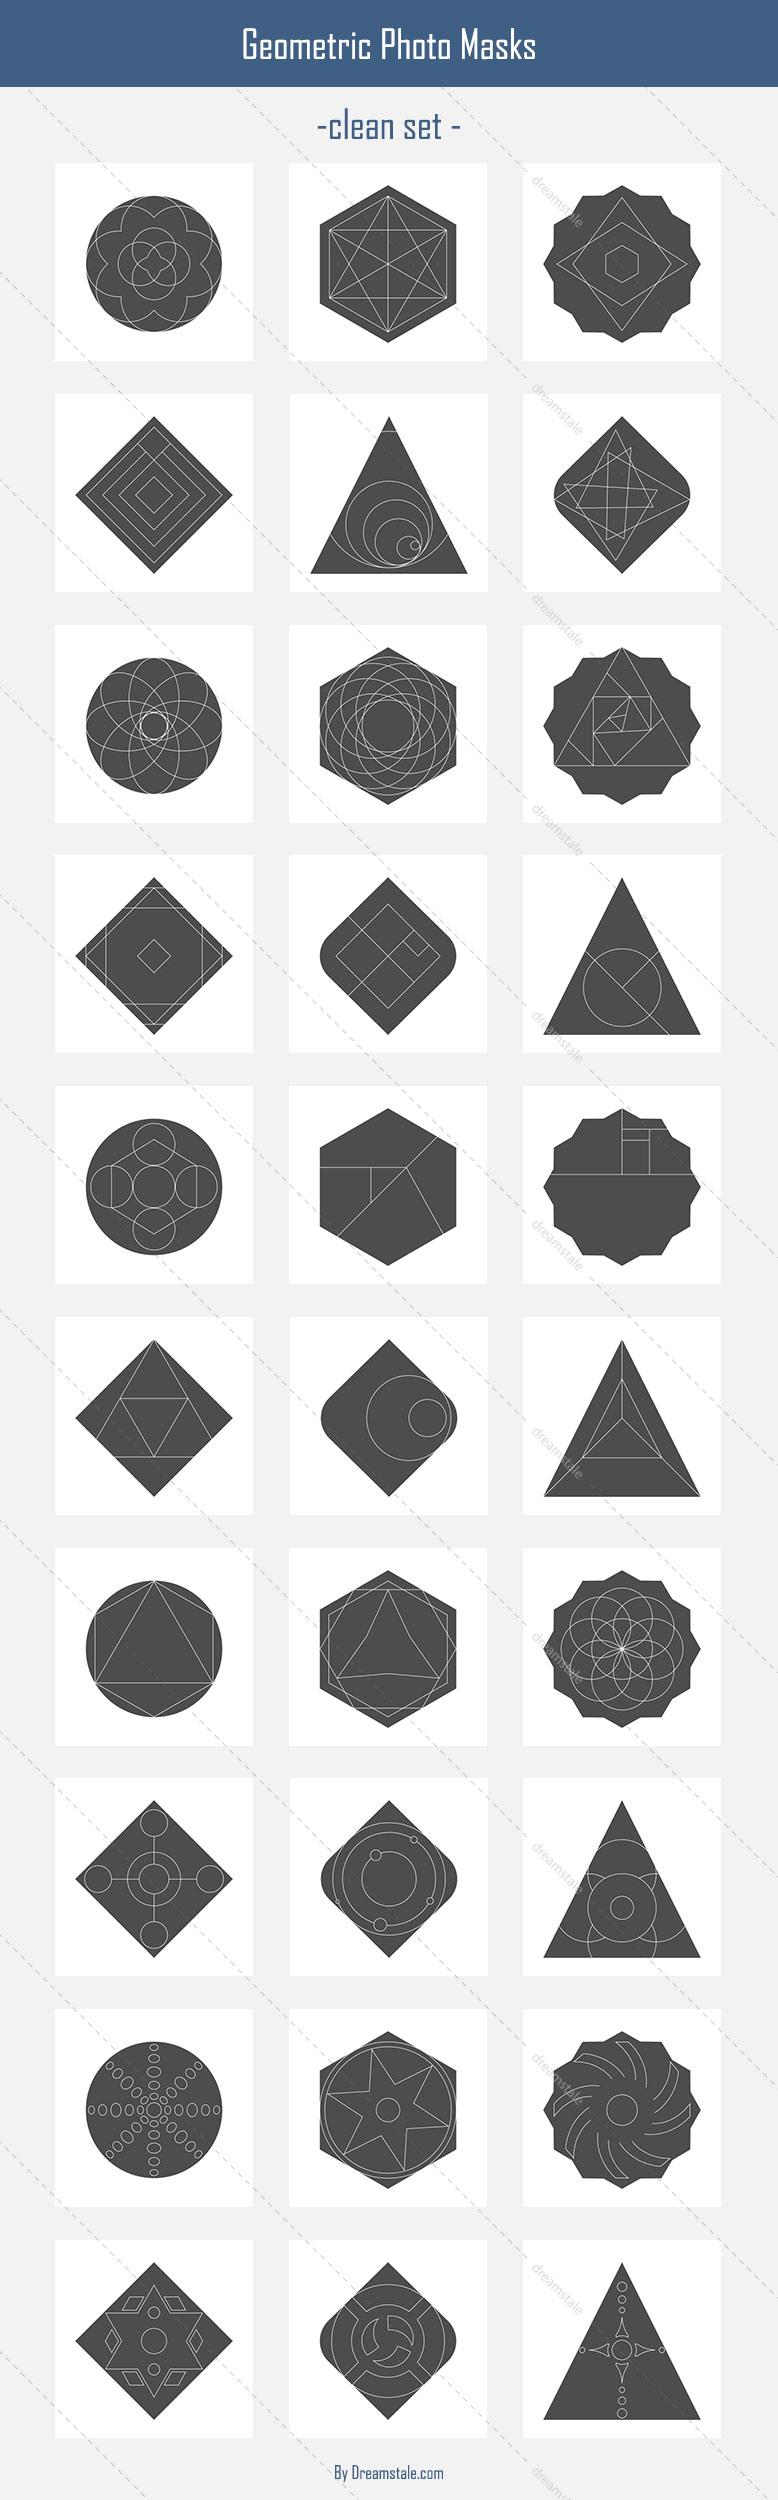 30-geometric-photo-masks-preview 2